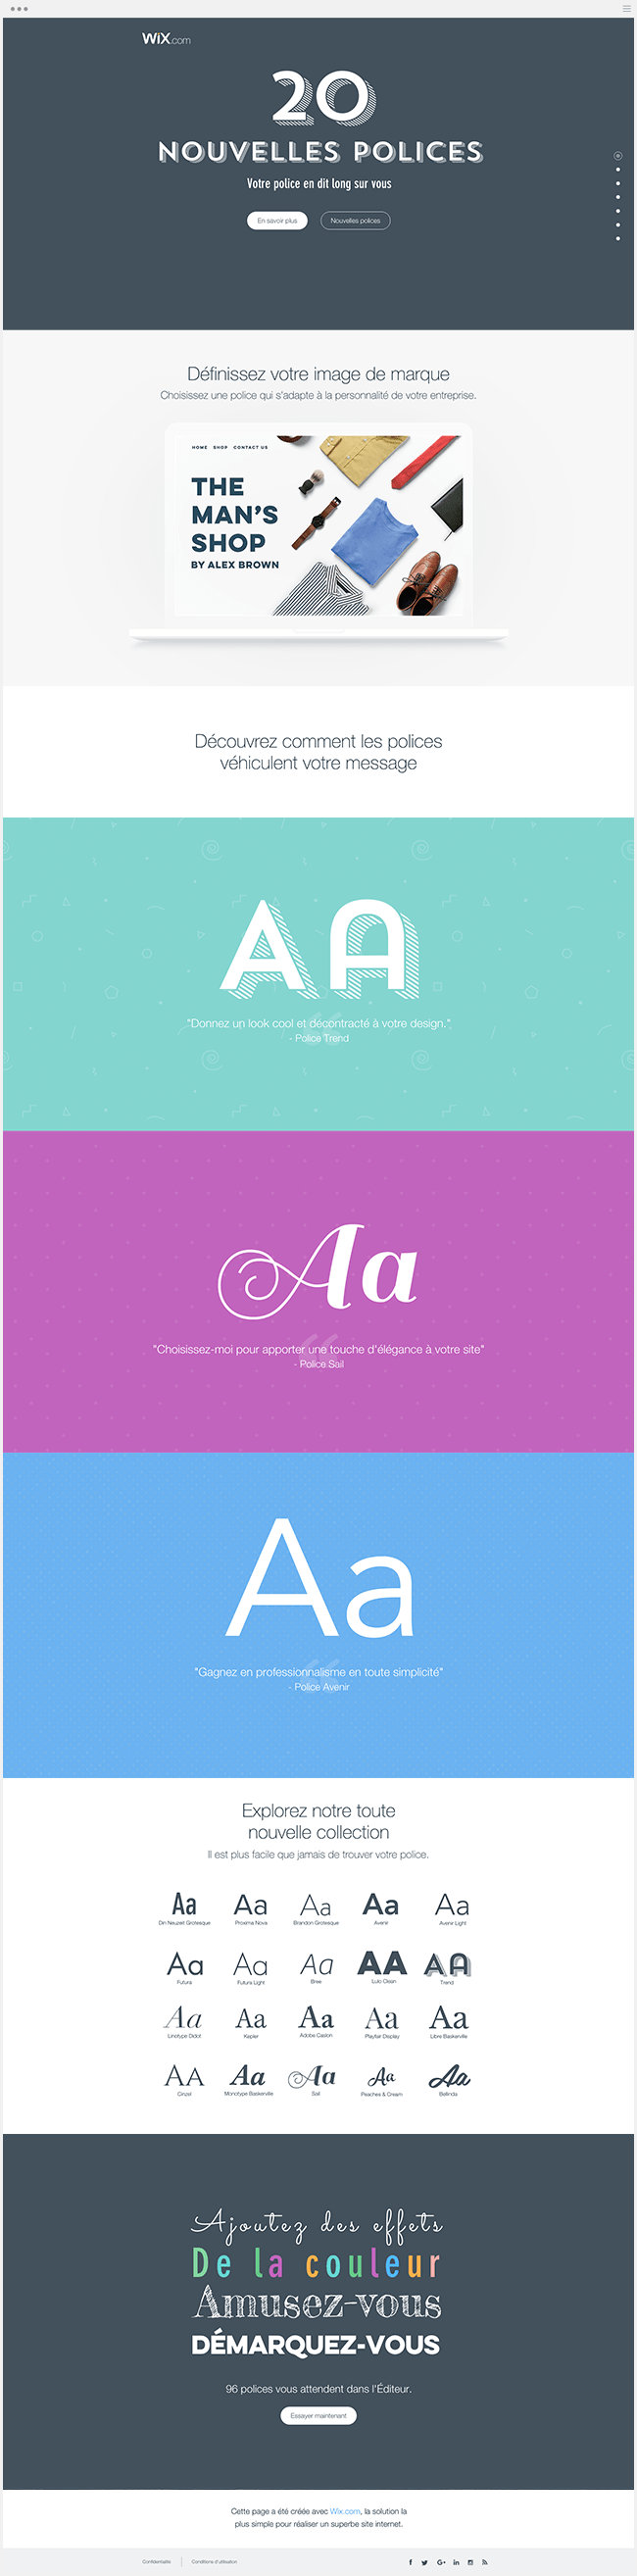 Landing Page Wix Polices de Caractères Typographie